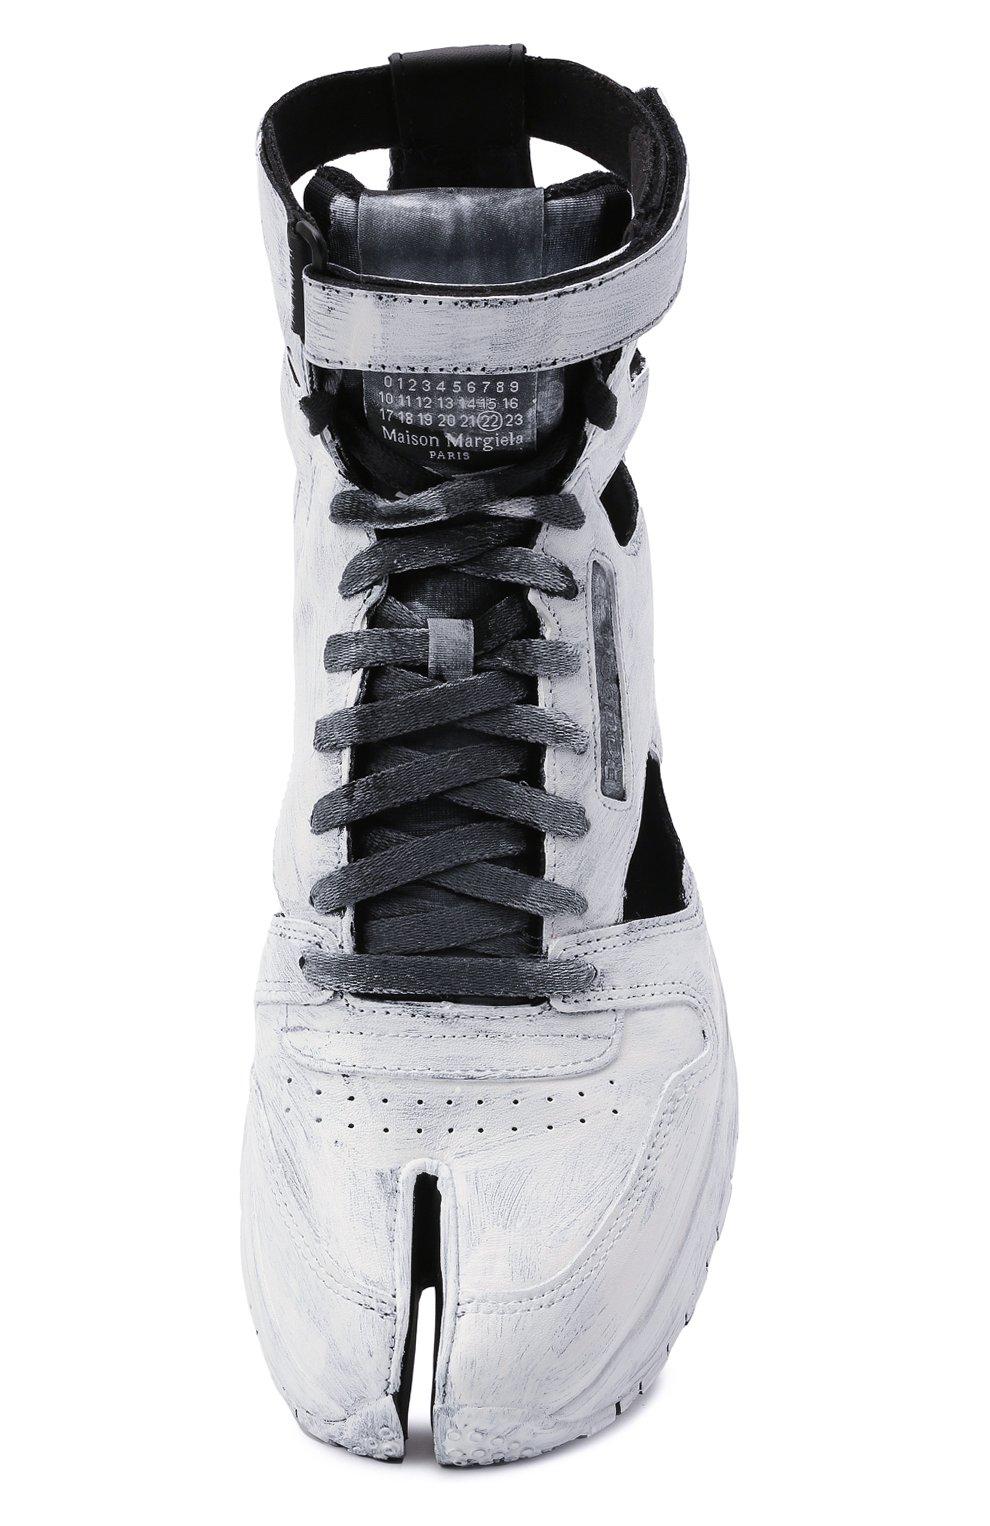 Мужские кроссовки tabi maison margiela x reebok classic MAISON MARGIELA белого цвета, арт. S37WS0569/P4242 | Фото 5 (Стили: Гранж; Материал внутренний: Текстиль; Подошва: Массивная)